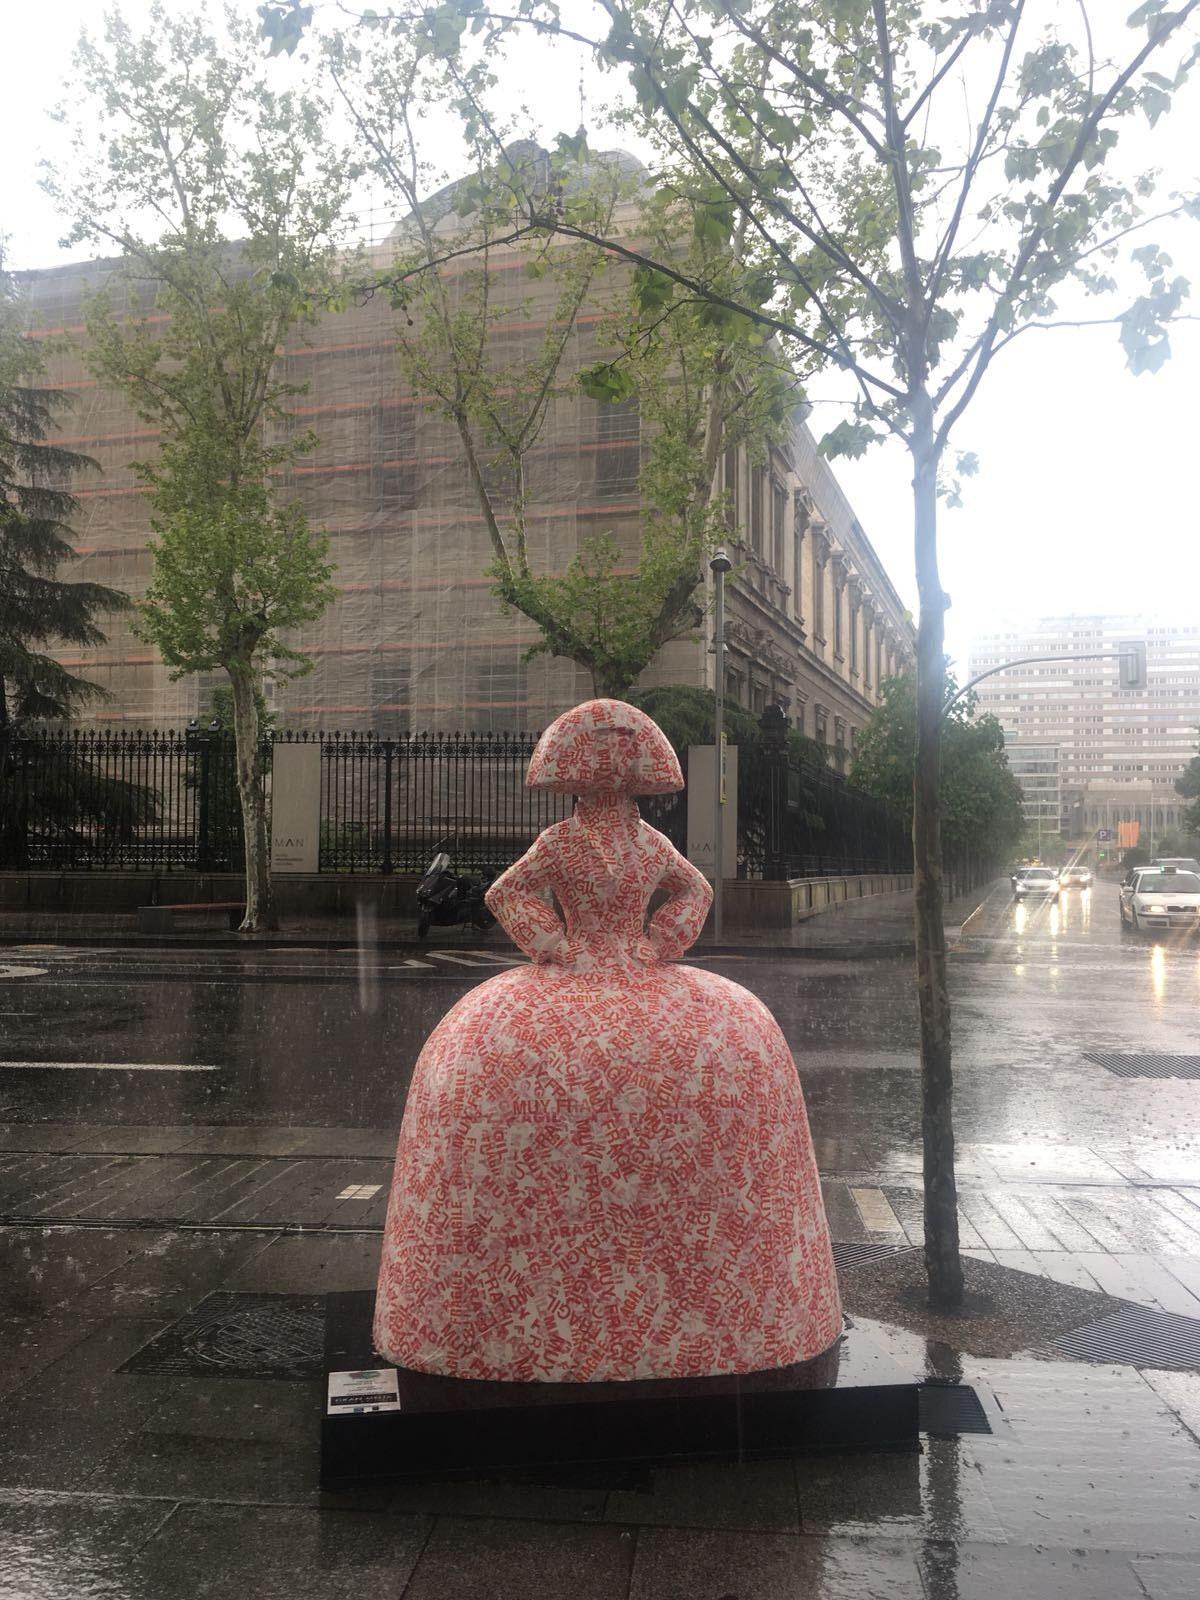 Menina Madrid Serrano Laura Ponte Pecora Madrid Moda Joyería Personalizado